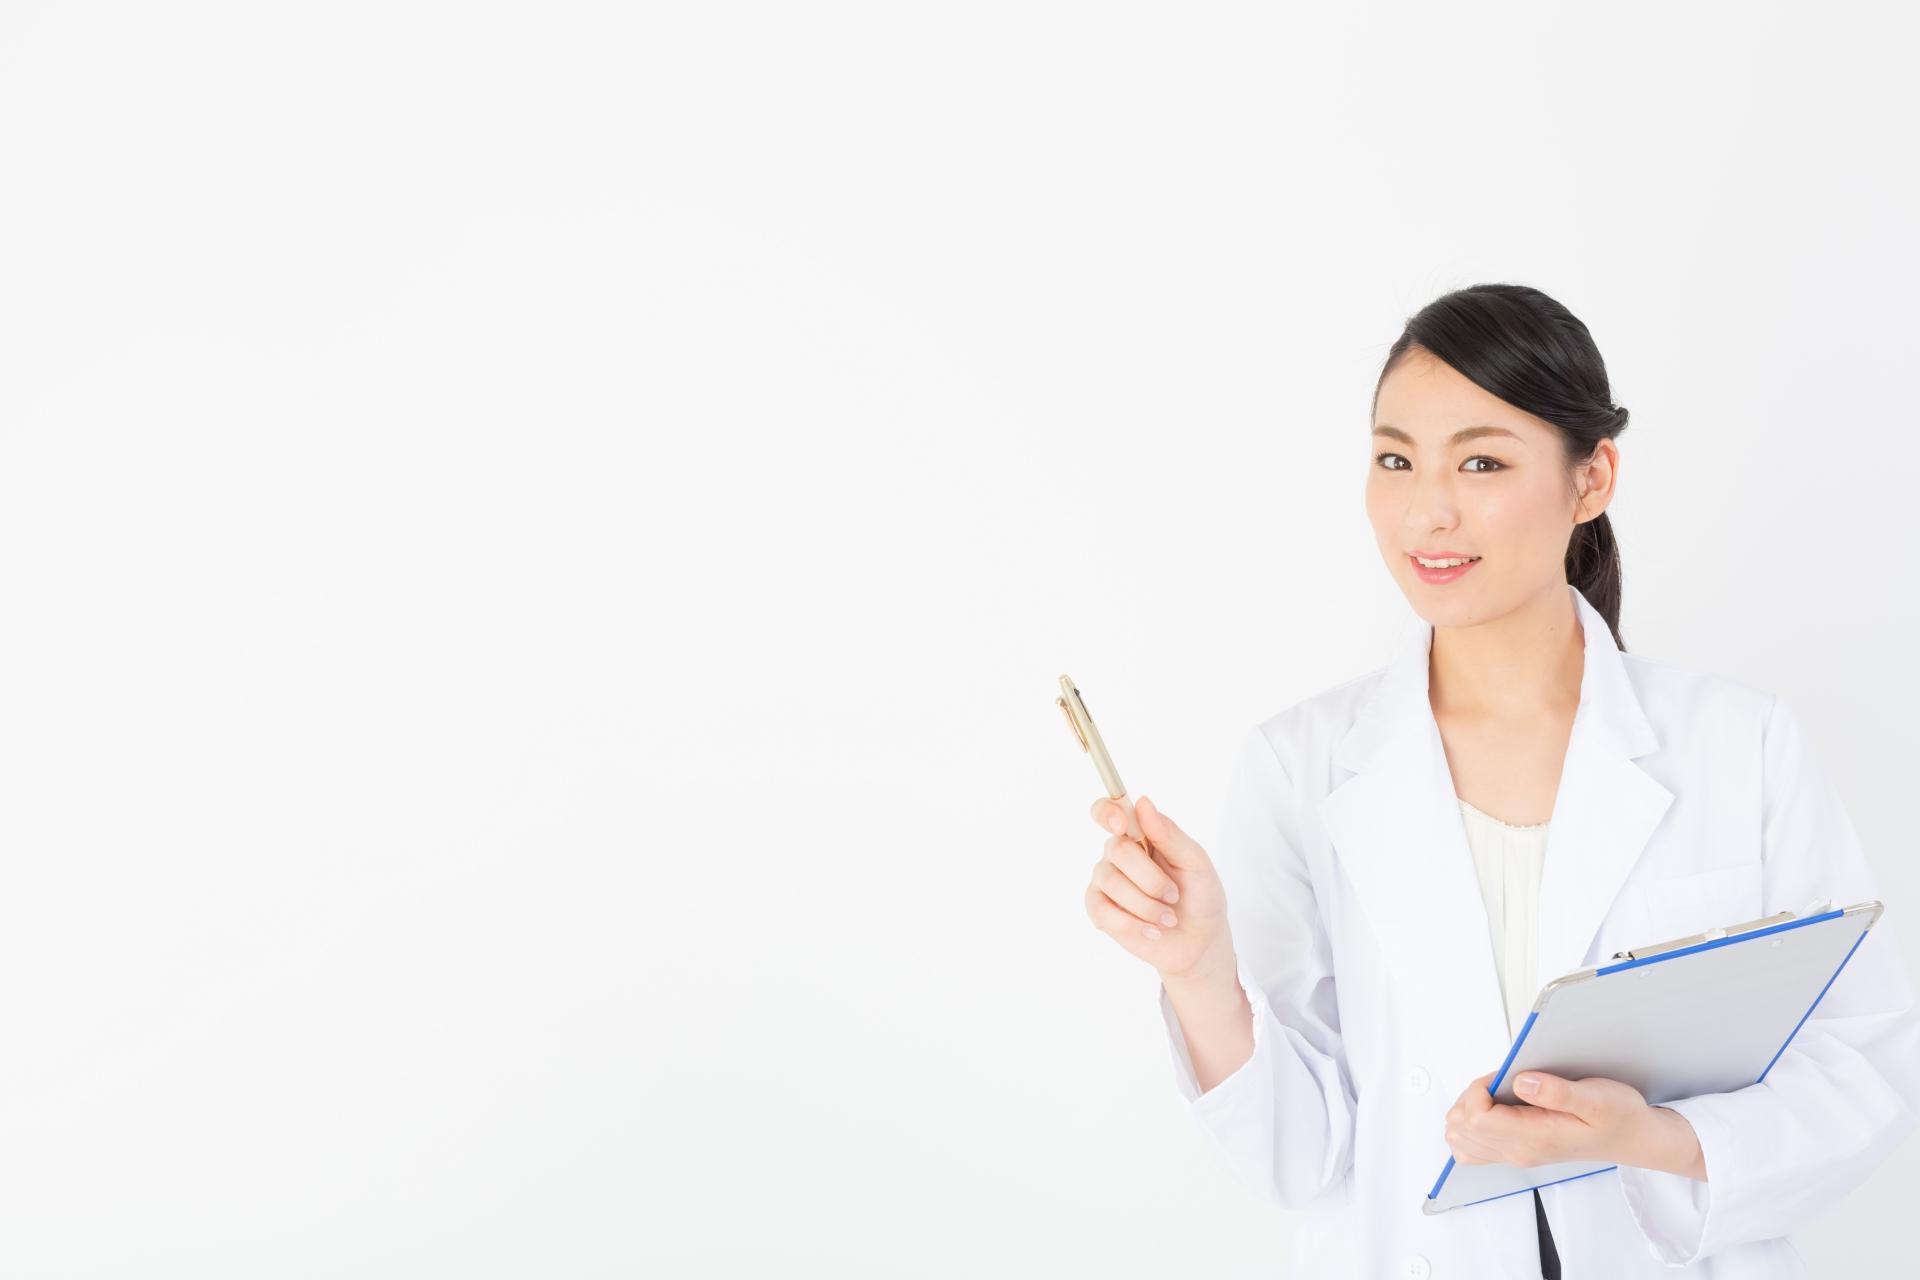 368af1238335081b98c1a416297da8af m フィナステリドは本当に効果ある?ある皮膚科医自身の治験